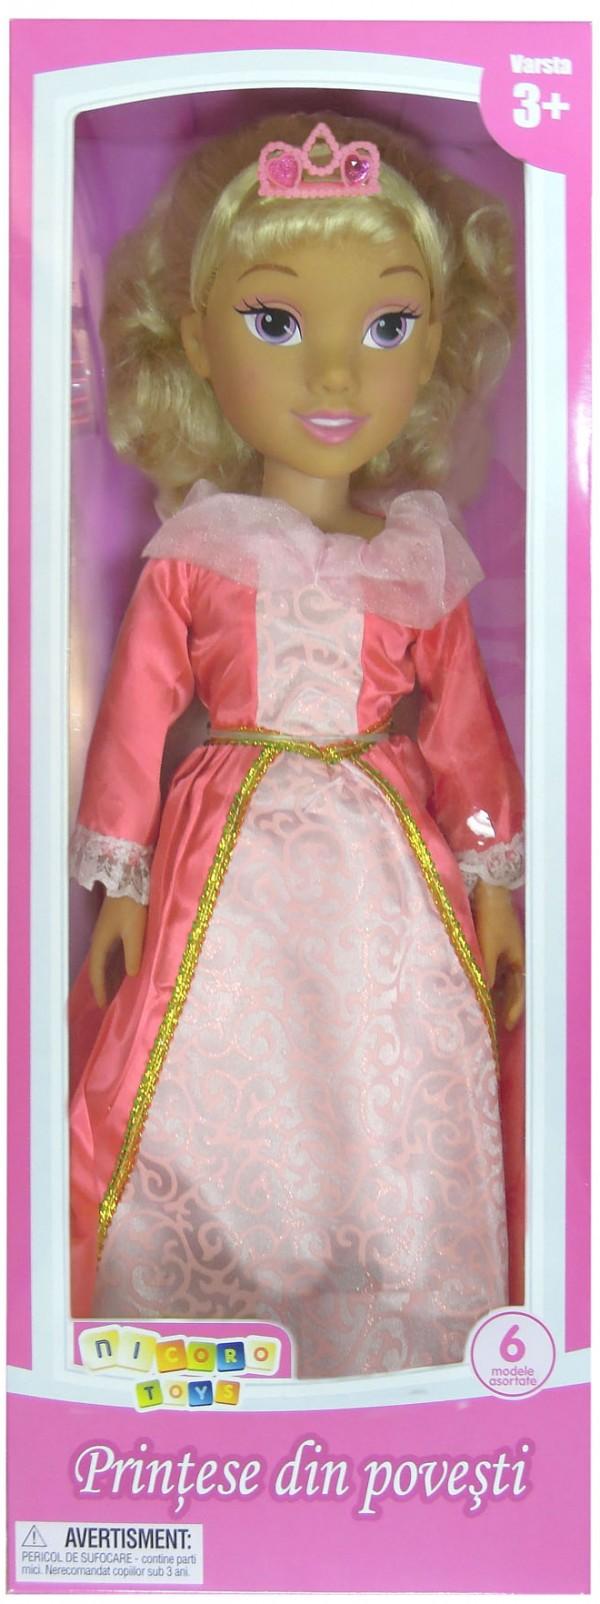 Papusa Printesa Roz